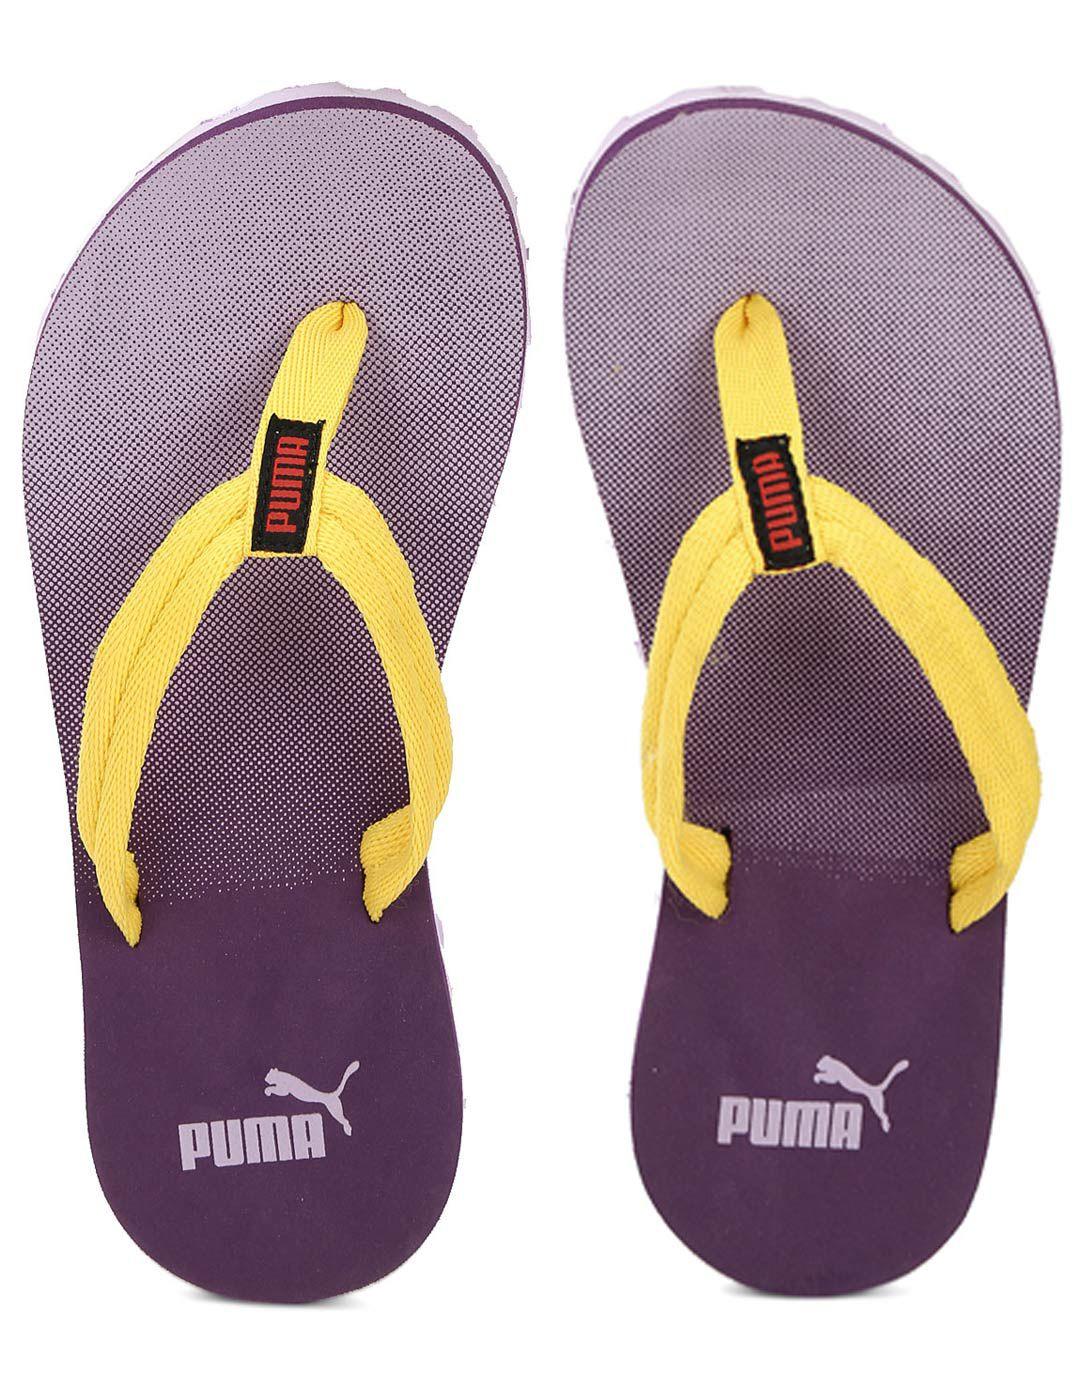 21c63f42ed puma backpacks myntra on sale > OFF36% Discounts